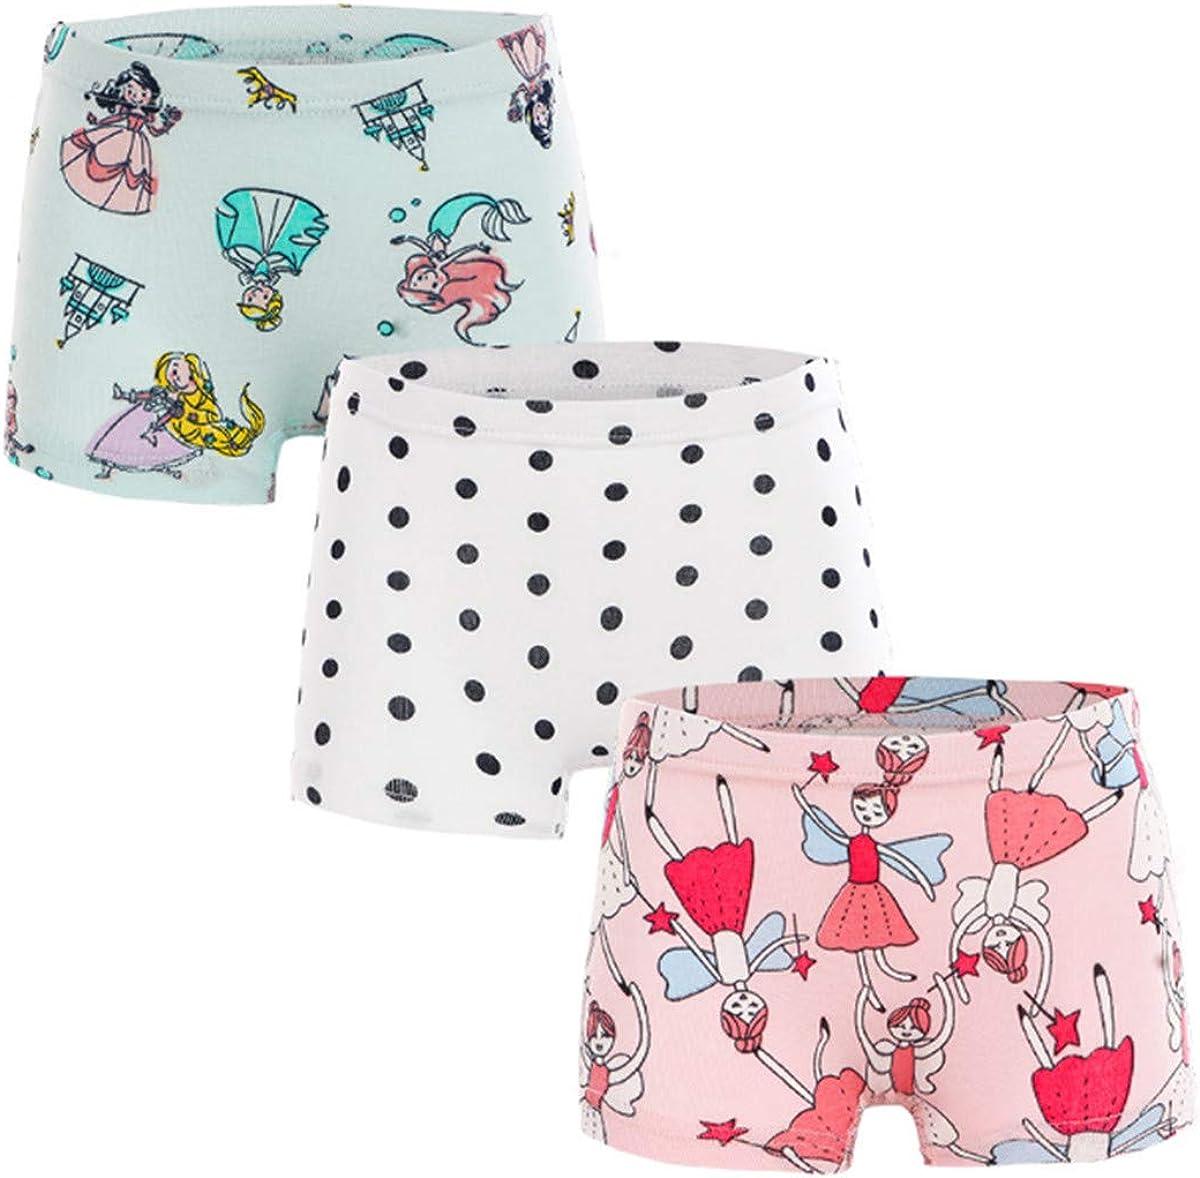 Quantity limited FOFJR Little Girls Briefs Underwear Cotton Panties Popular standard 100% Boyshort